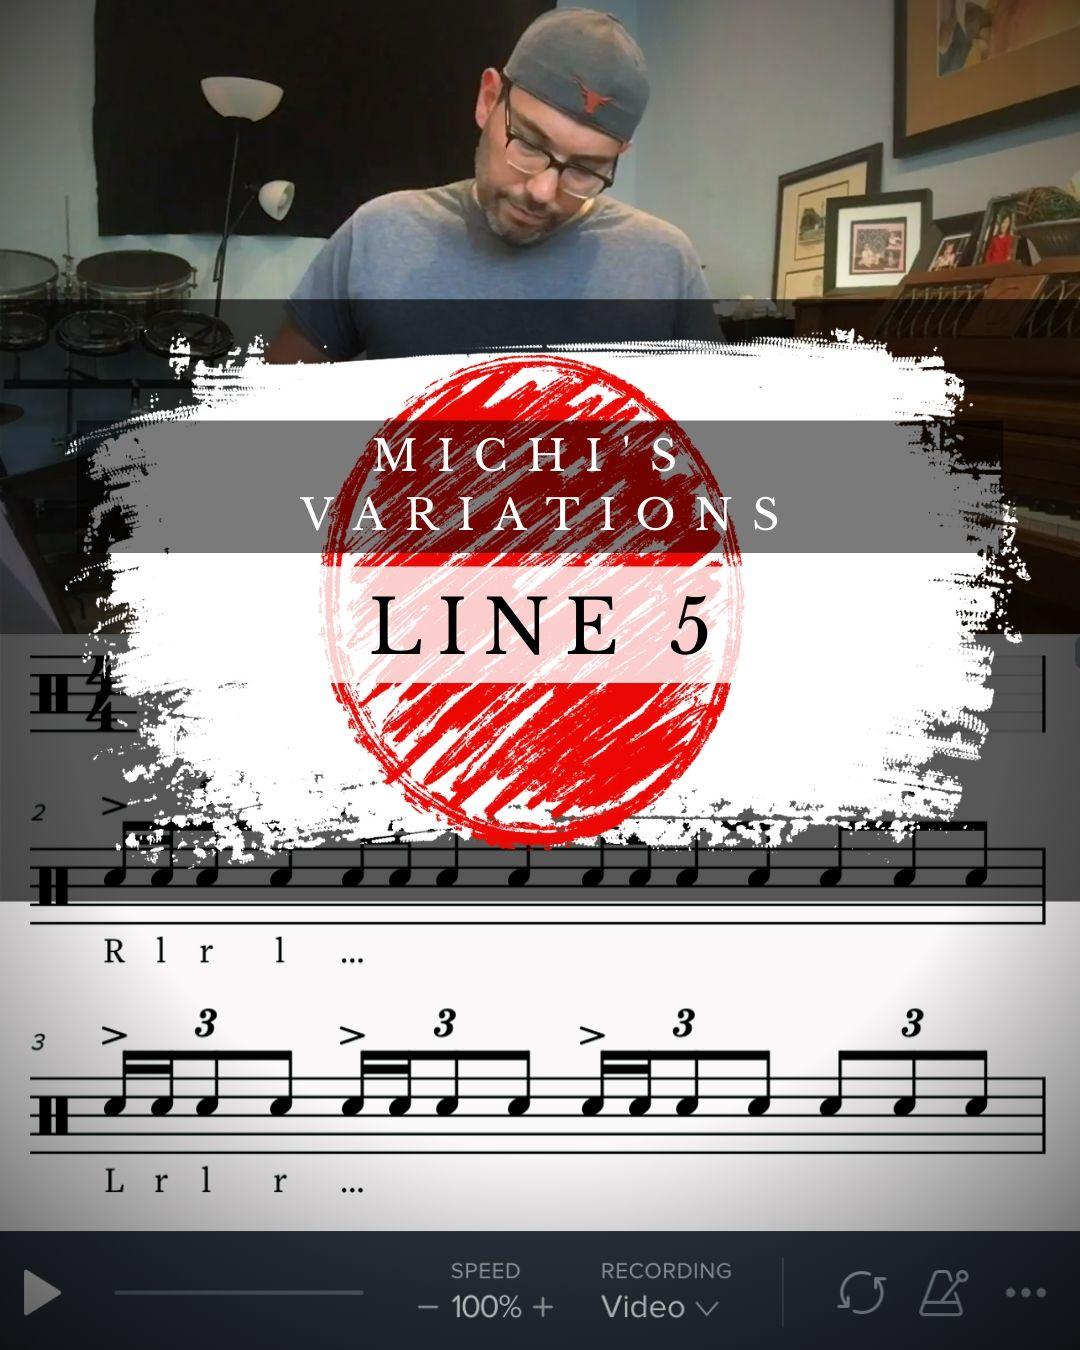 Michi's Variations Line 5